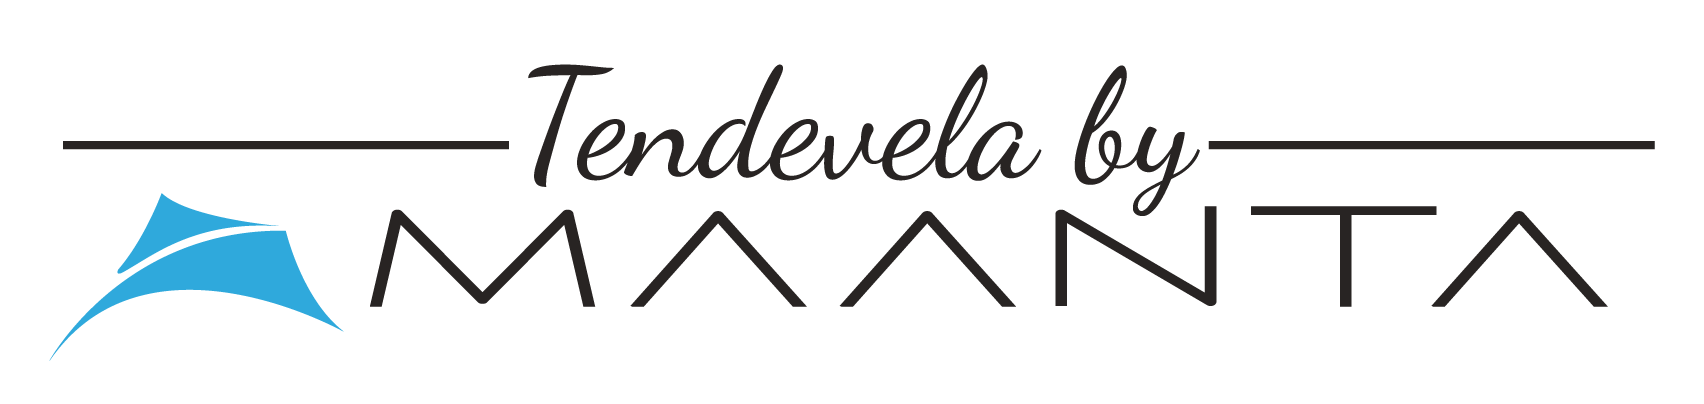 TendeVela